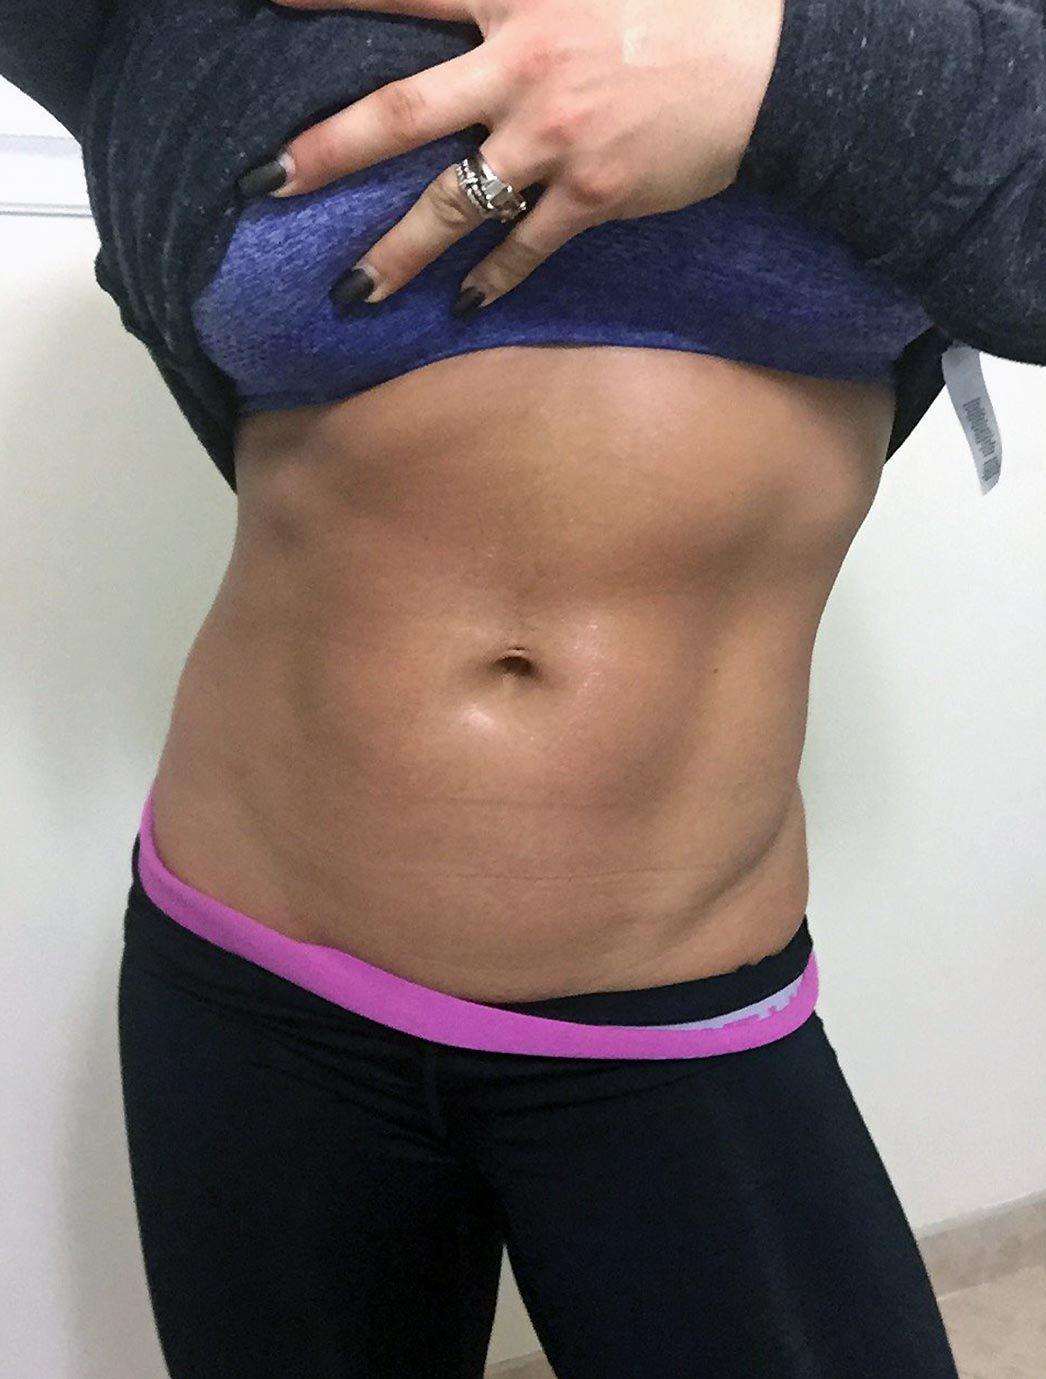 Celeste Bonin Nude Leaked The Fappening & Sexy 0247